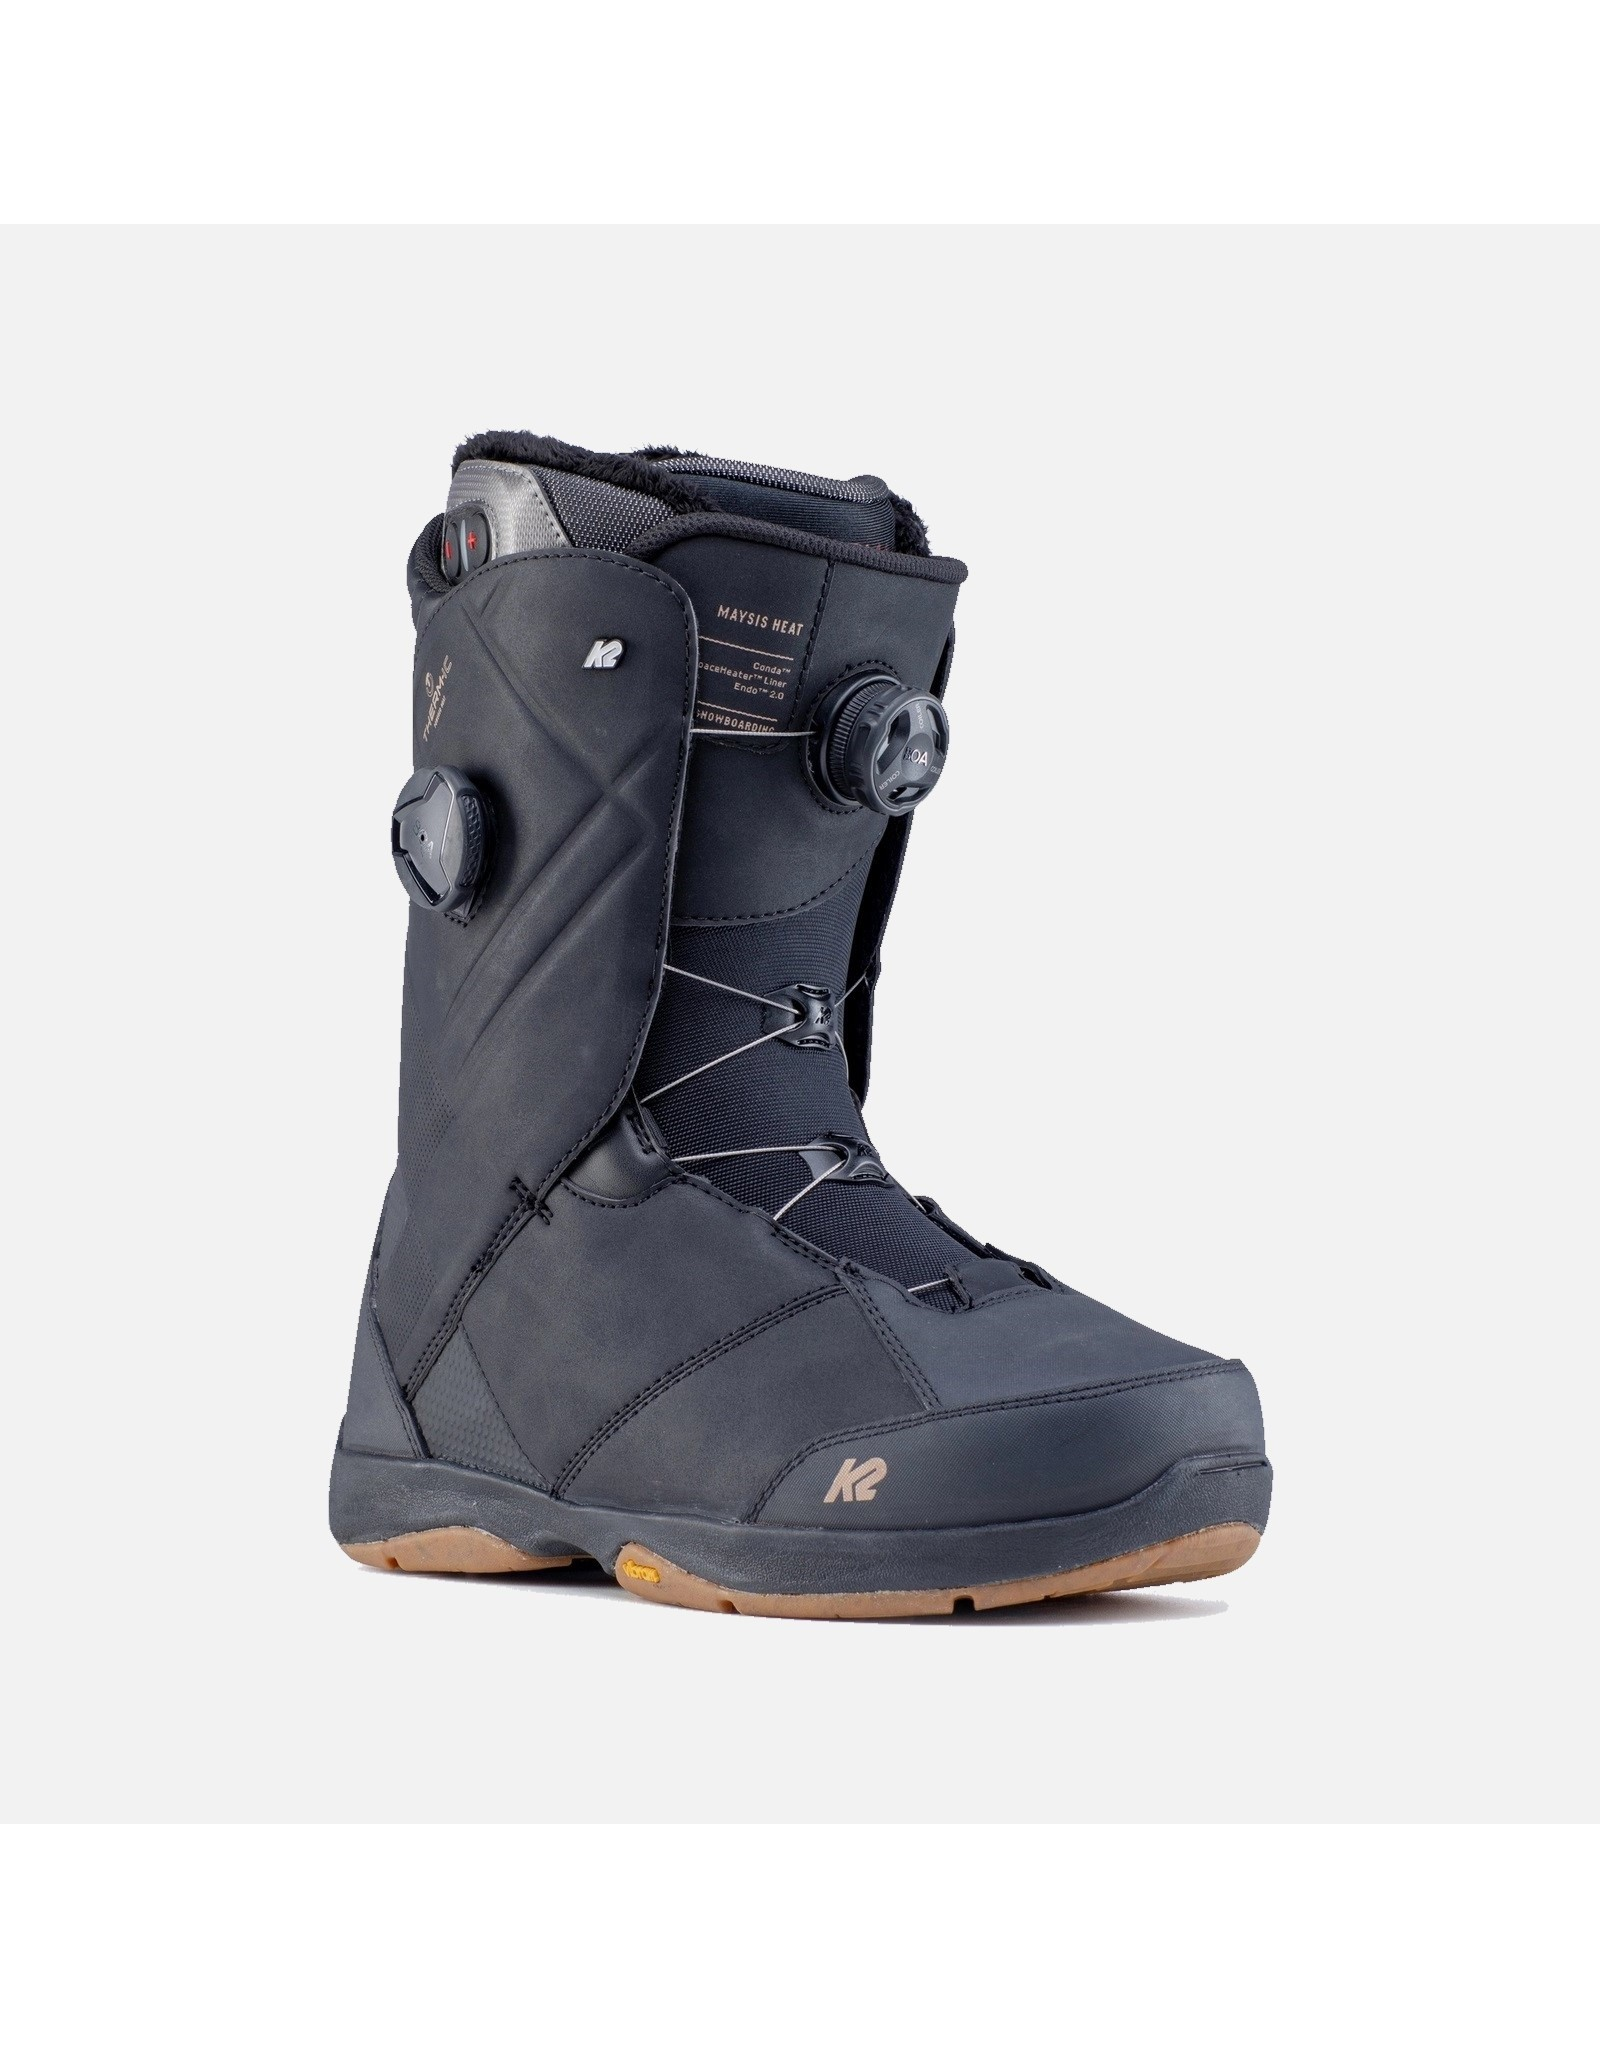 K2 Maysis Heat Boot